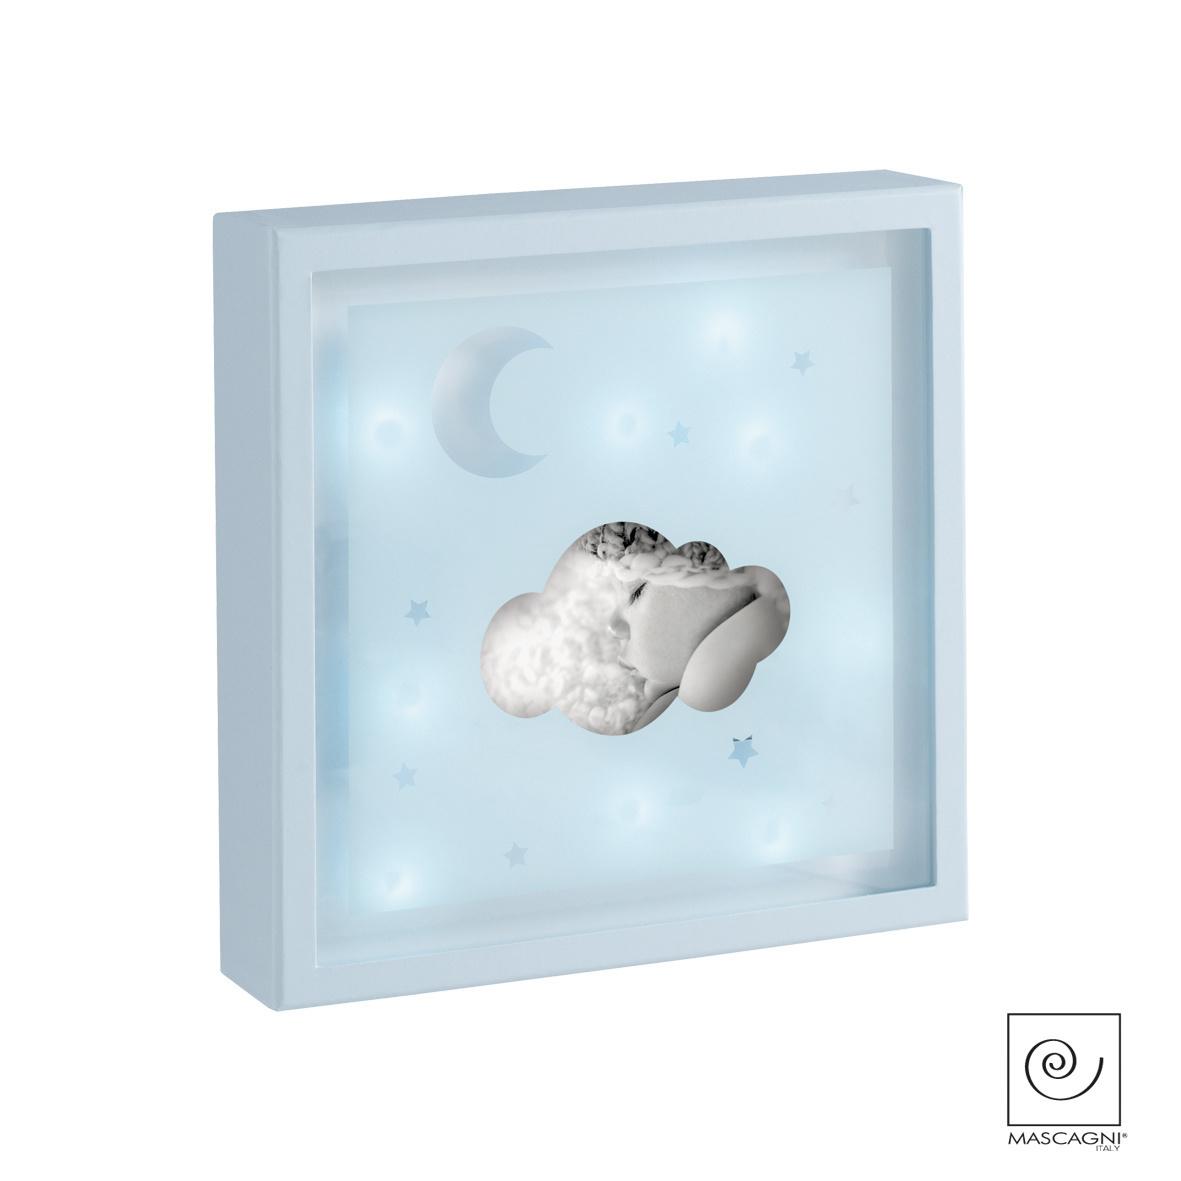 Art Mascagni A815 PHOTO FRAME LED 23X23 - COL. BLUE